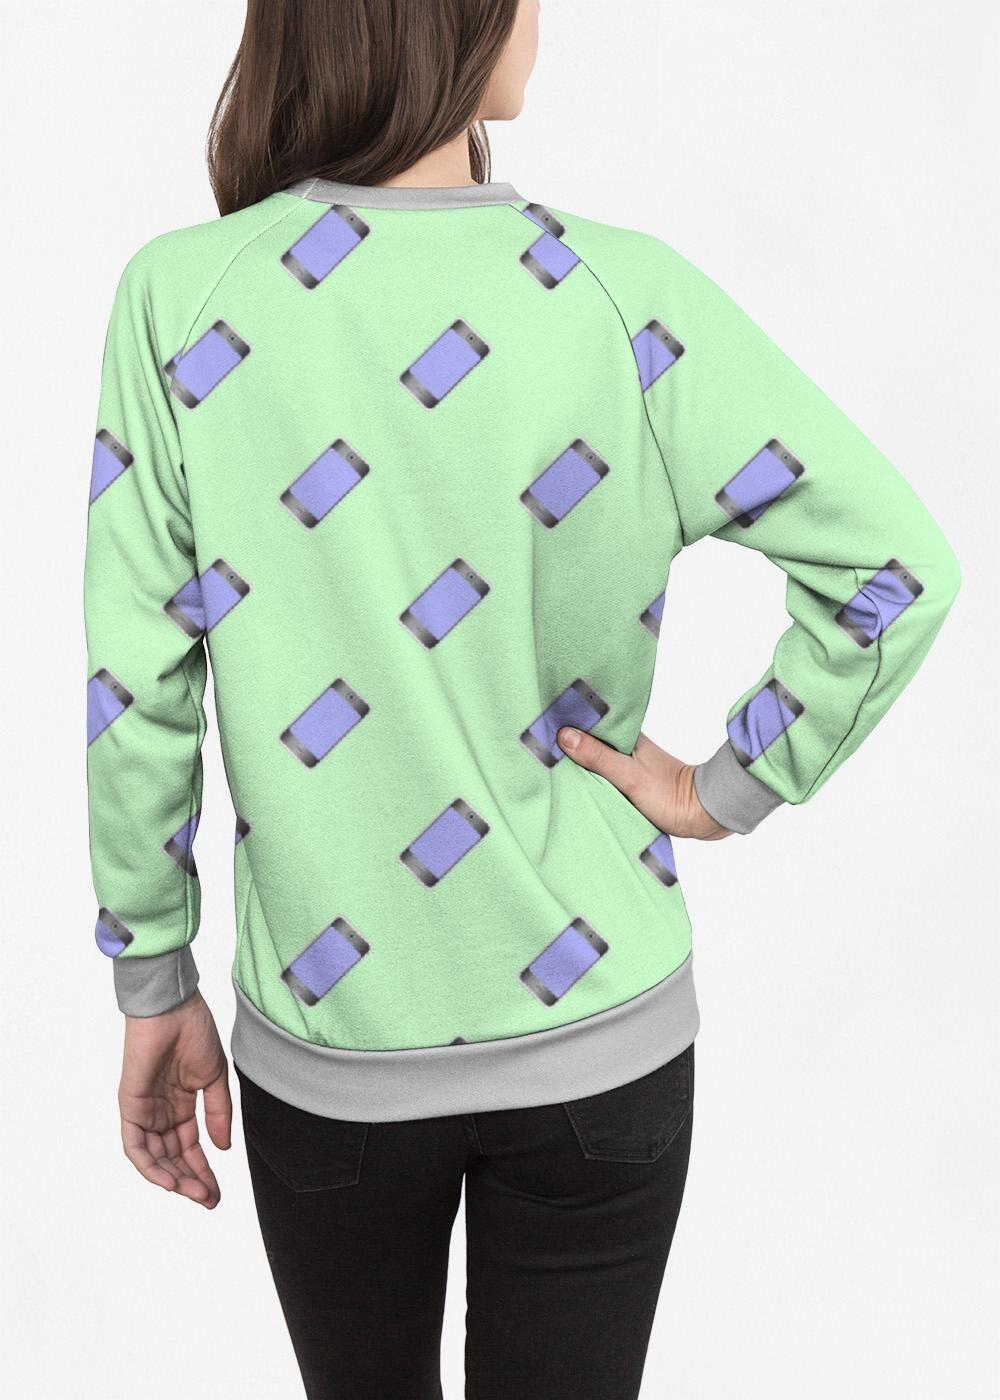 VIDA Women's Crewneck Sweatshirt - Mobile Phones On Green in Green by VIDA Original Artist  - Size: Small